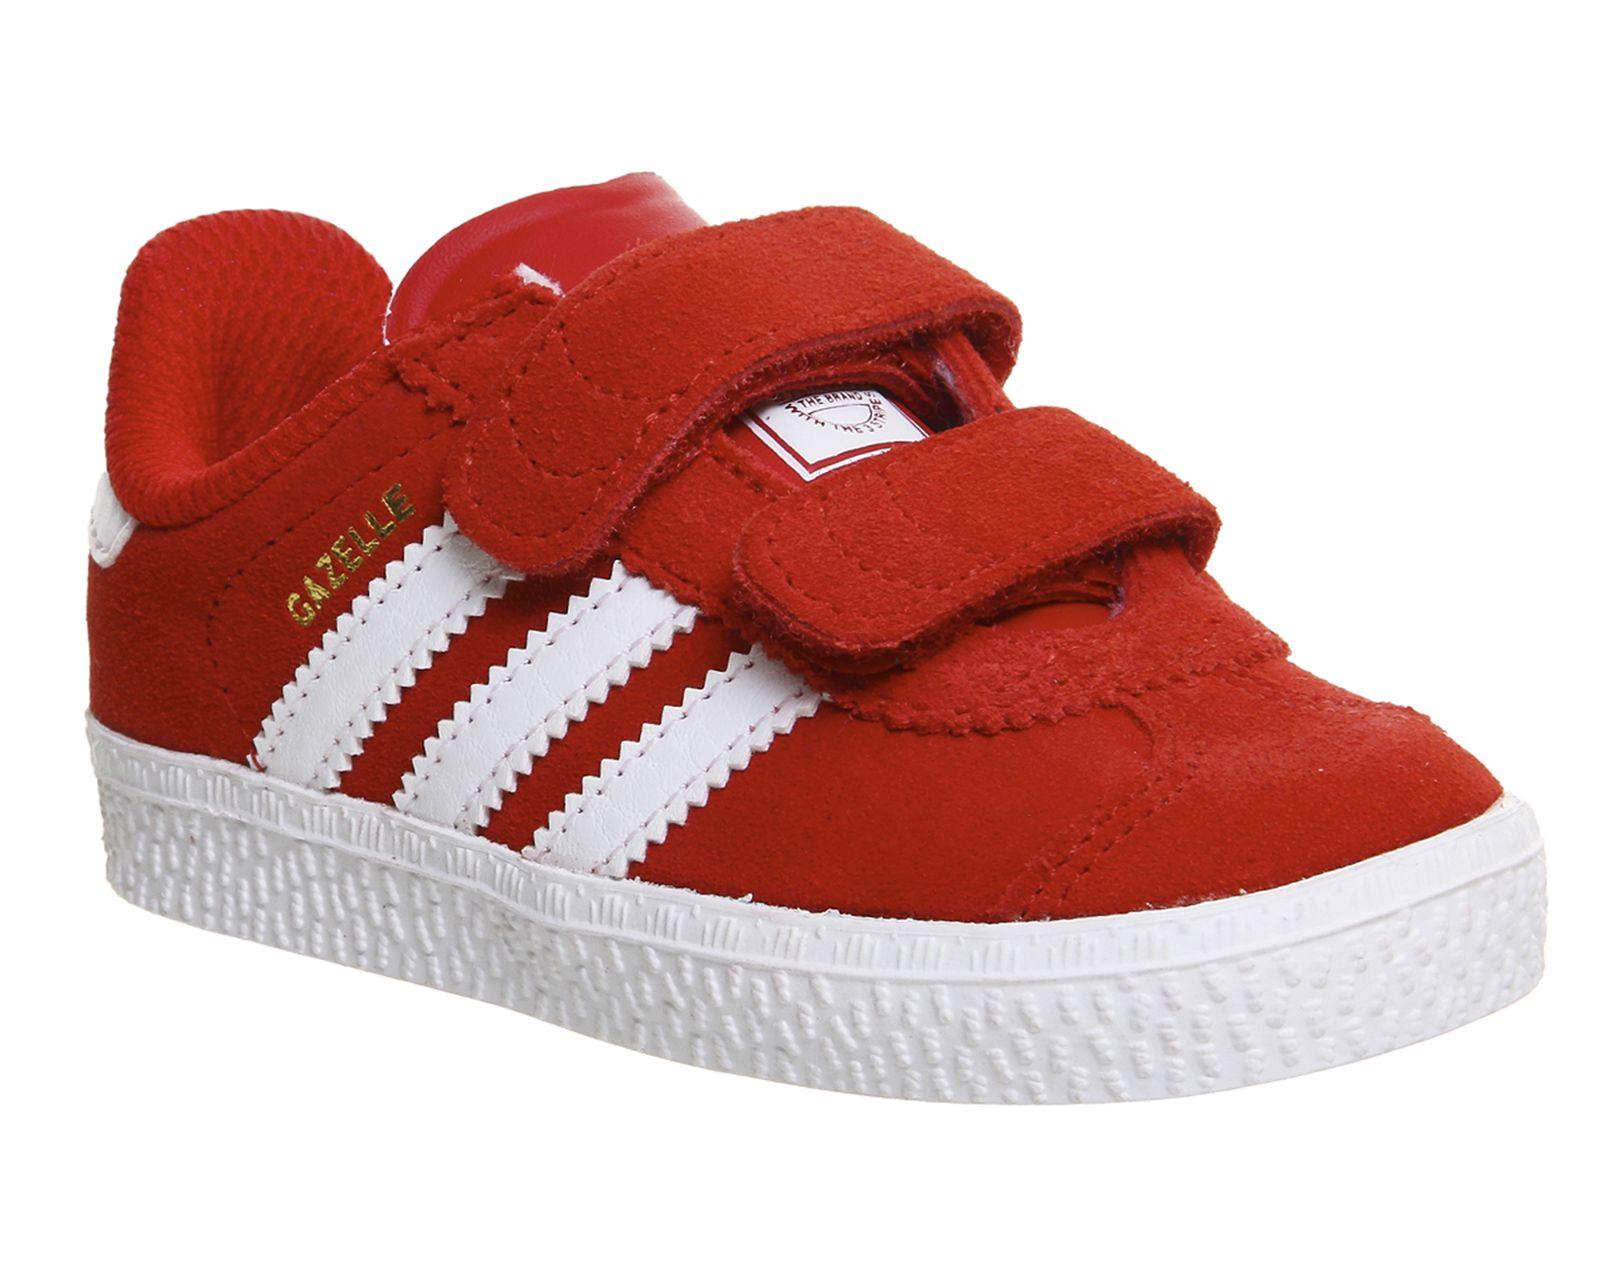 Buy Lush Red White Adidas Gazelle 2 Infant from OFFICE.co.uk